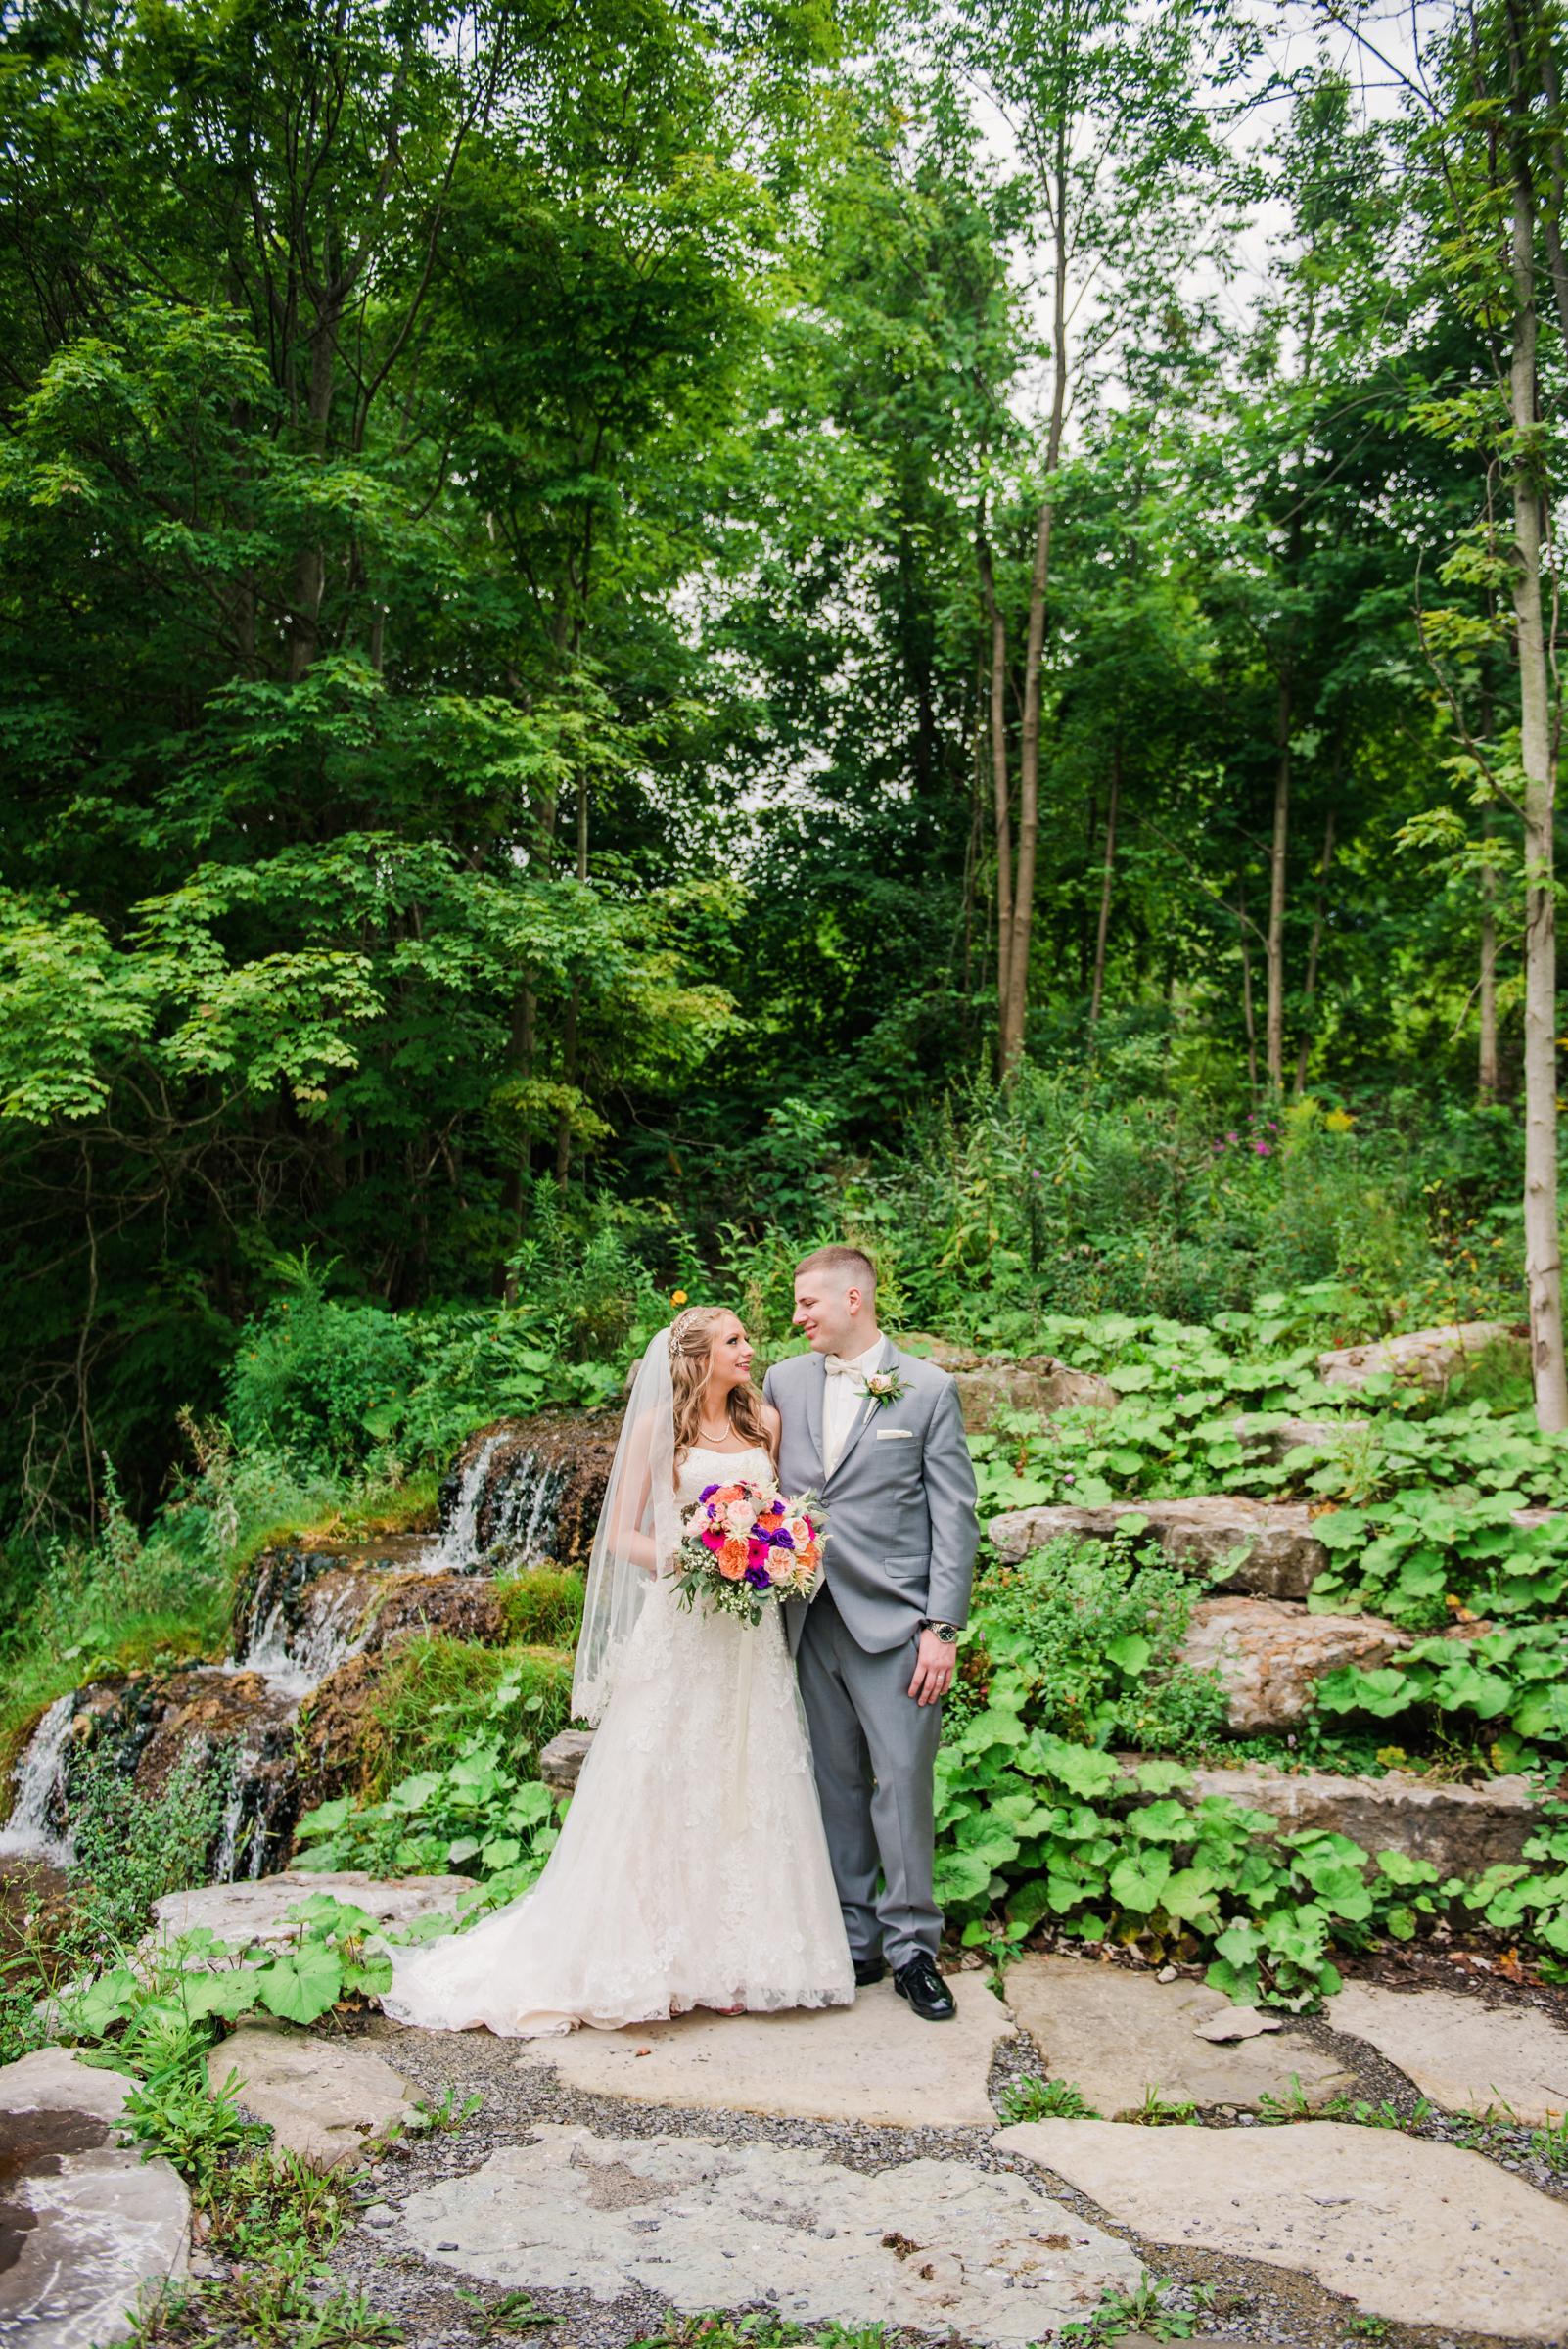 Wolf_Oak_Acres_Central_NY_Wedding_JILL_STUDIO_Rochester_NY_Photographer_DSC_8690.jpg